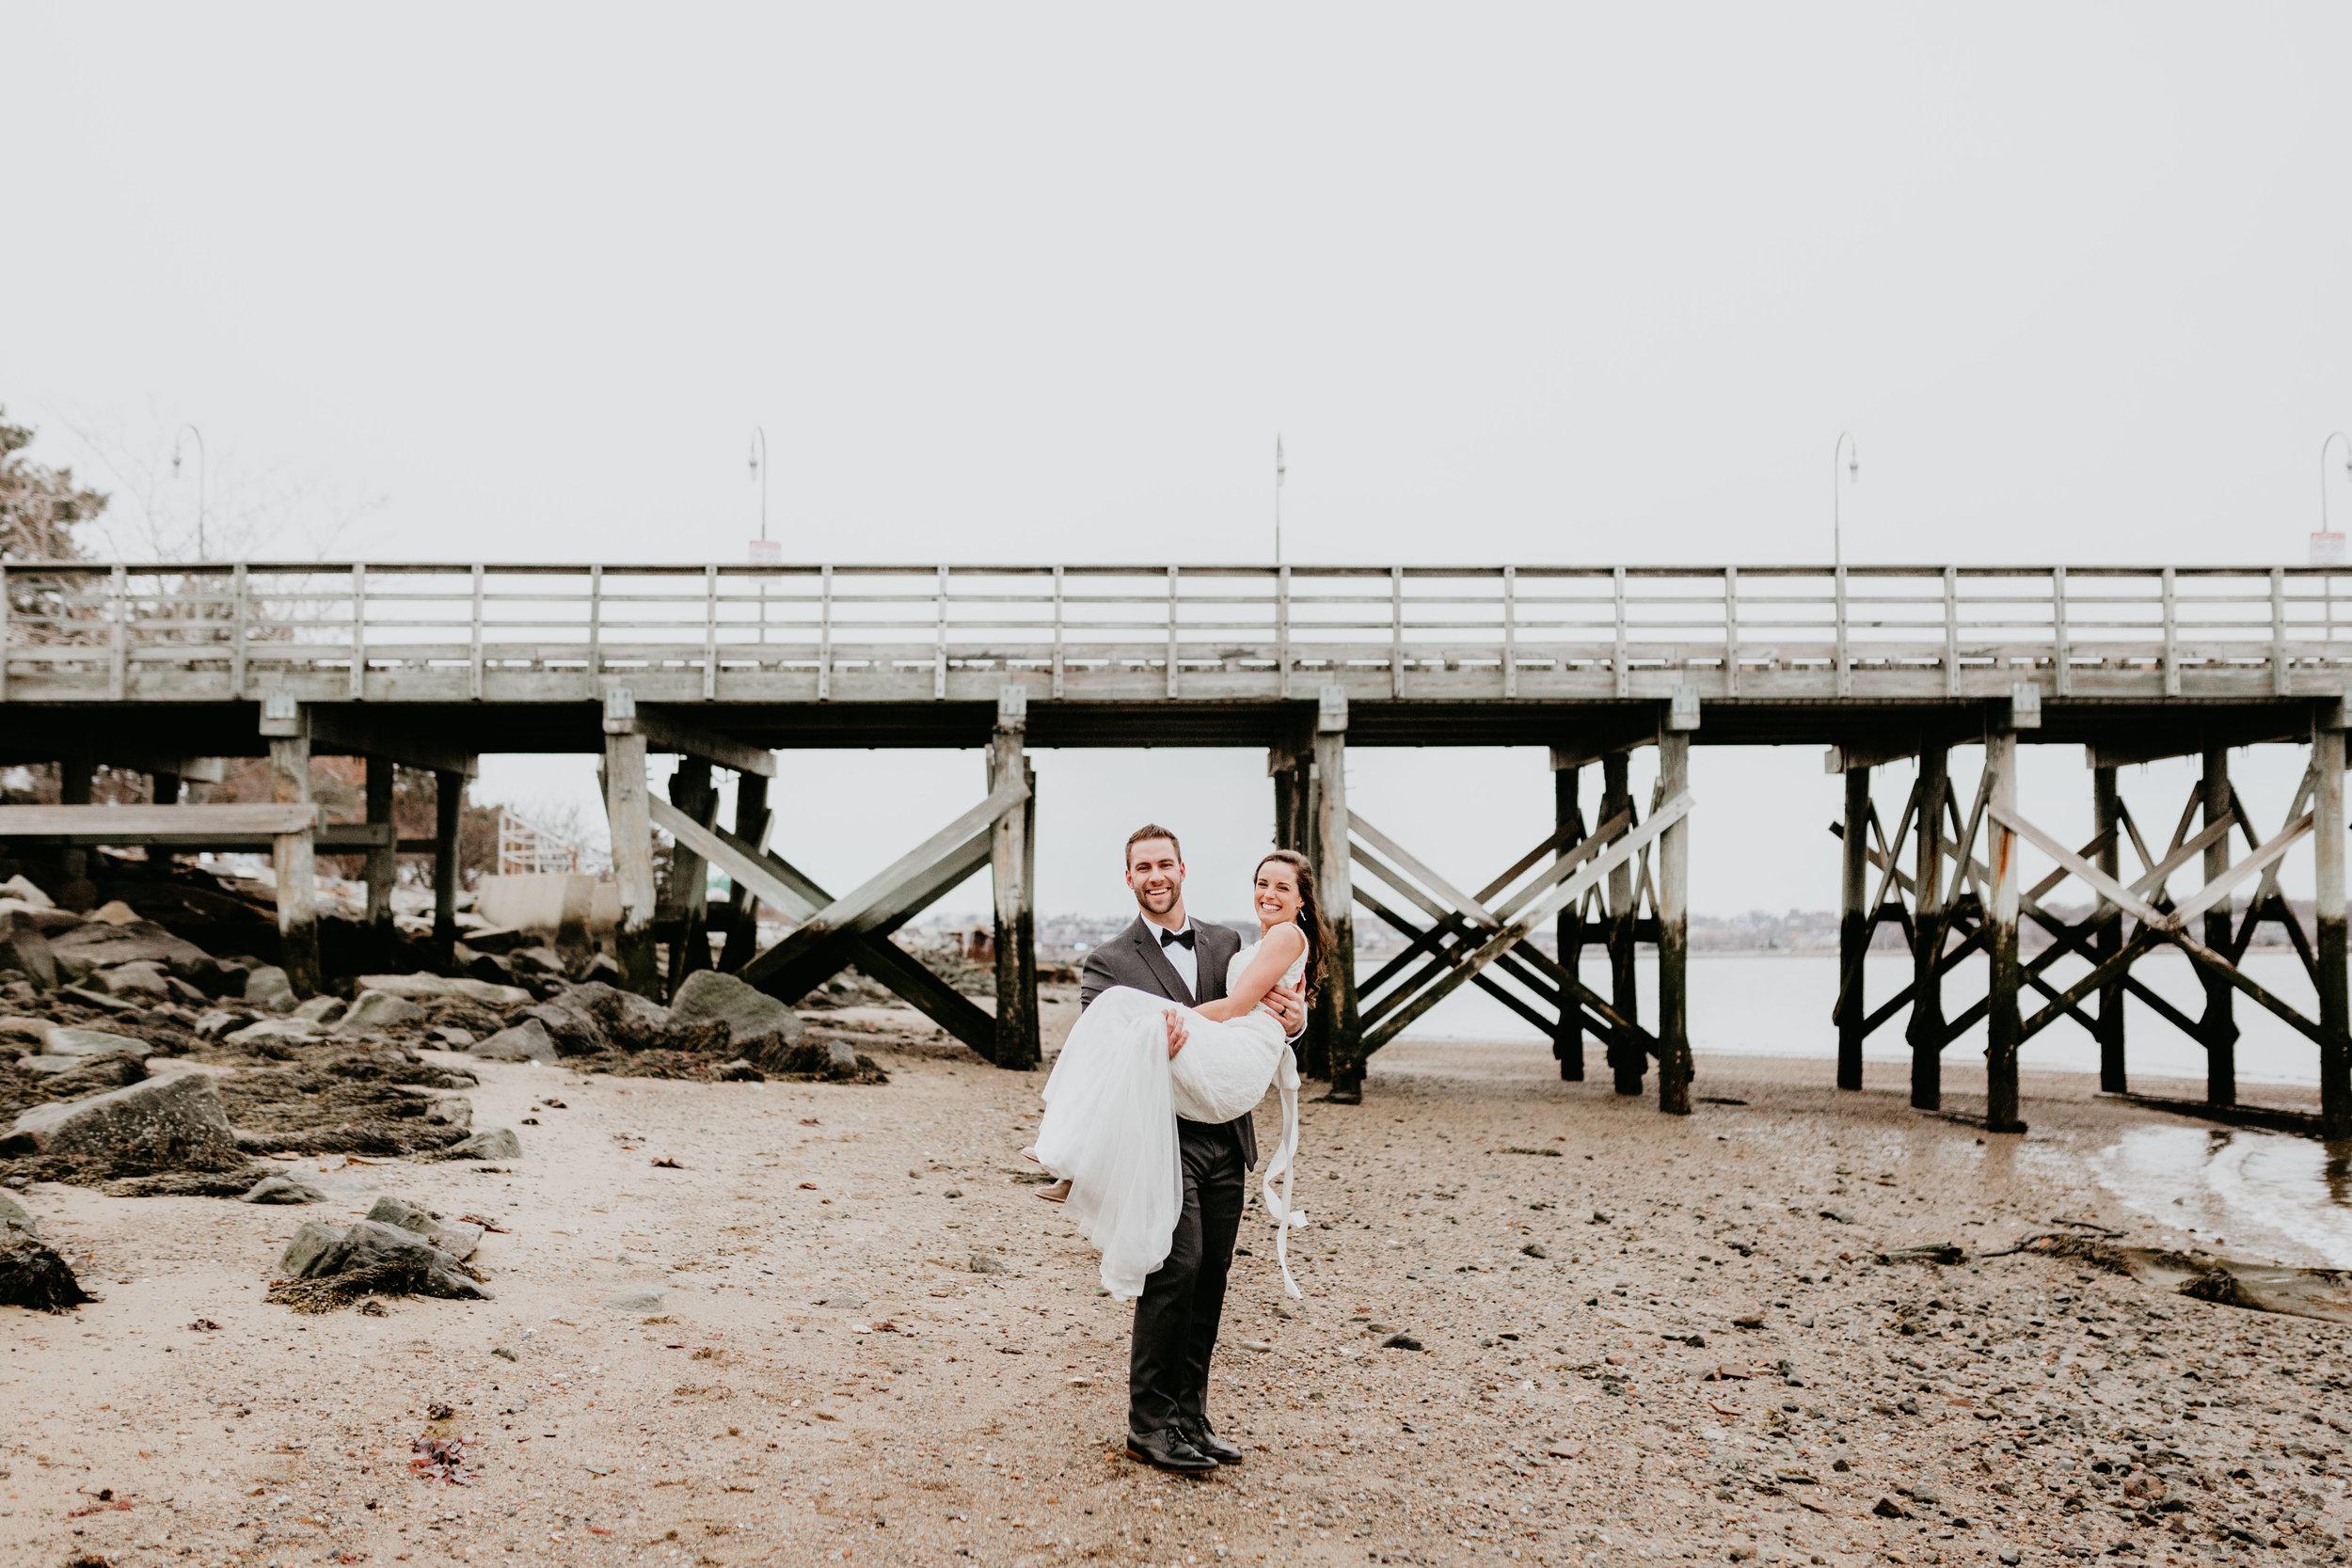 nicole-daacke-photography-boston-massachusetts-seaside-intimate-winter-wedding-photographer-41.jpg